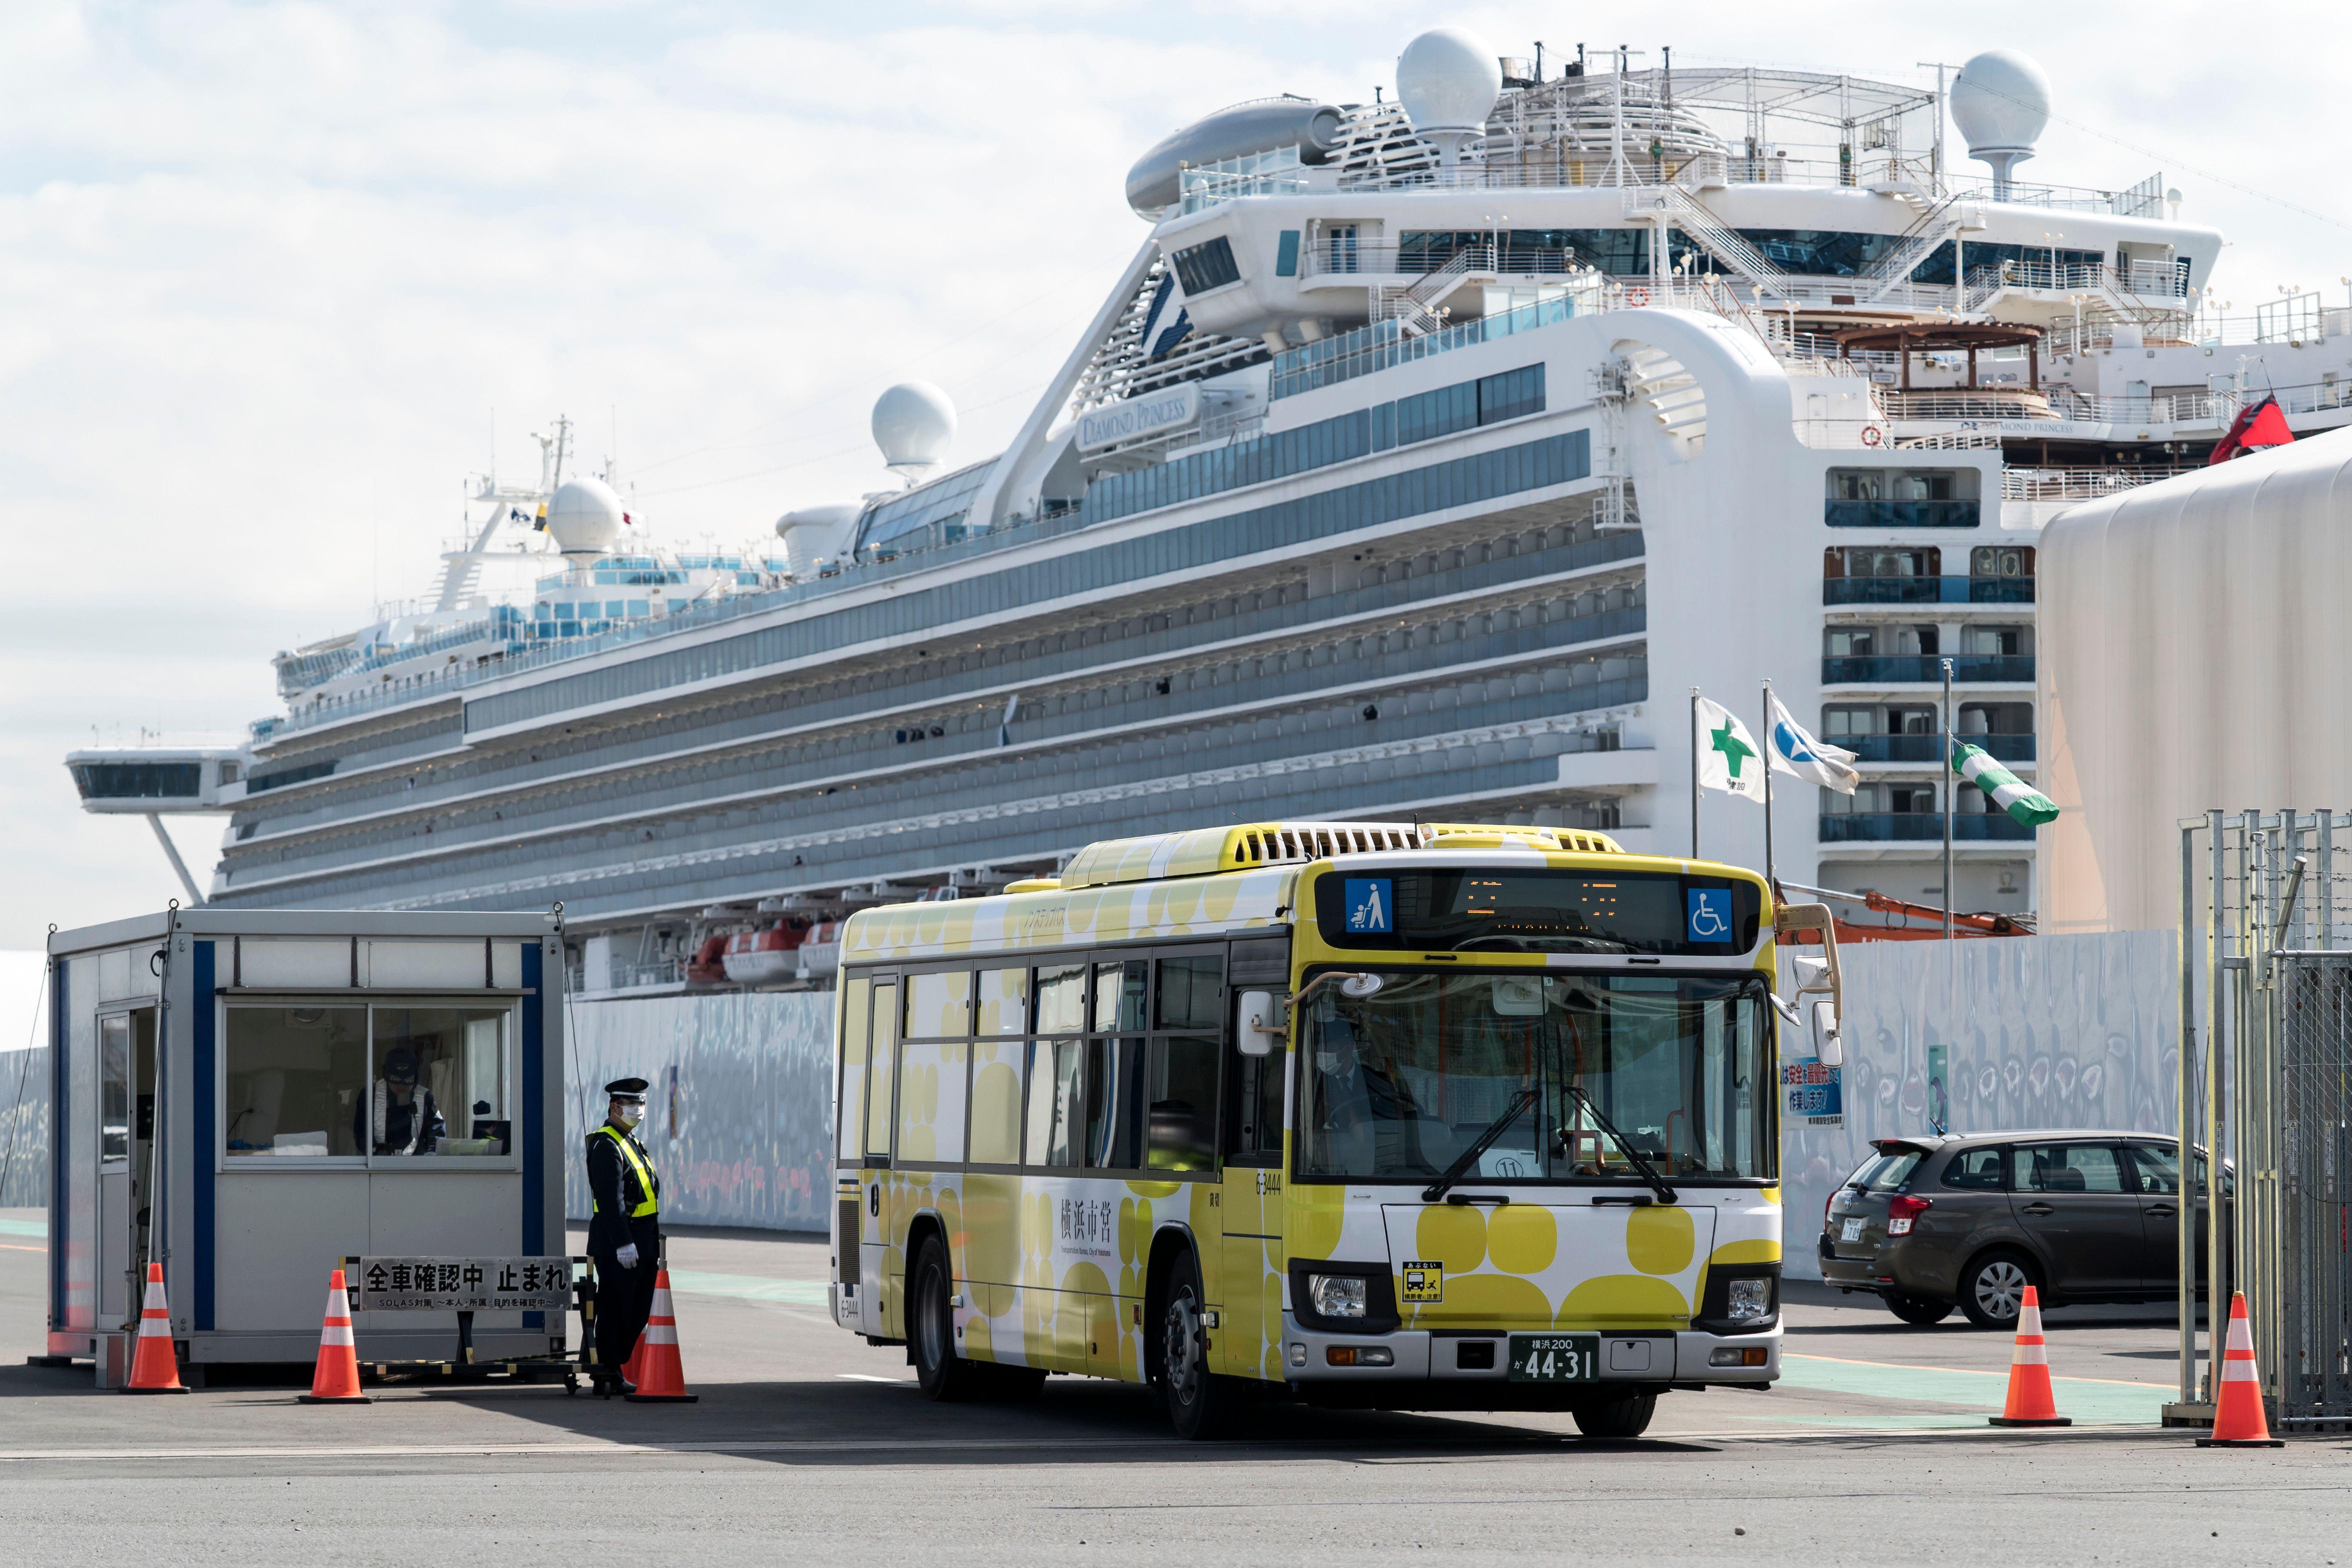 Bus at port